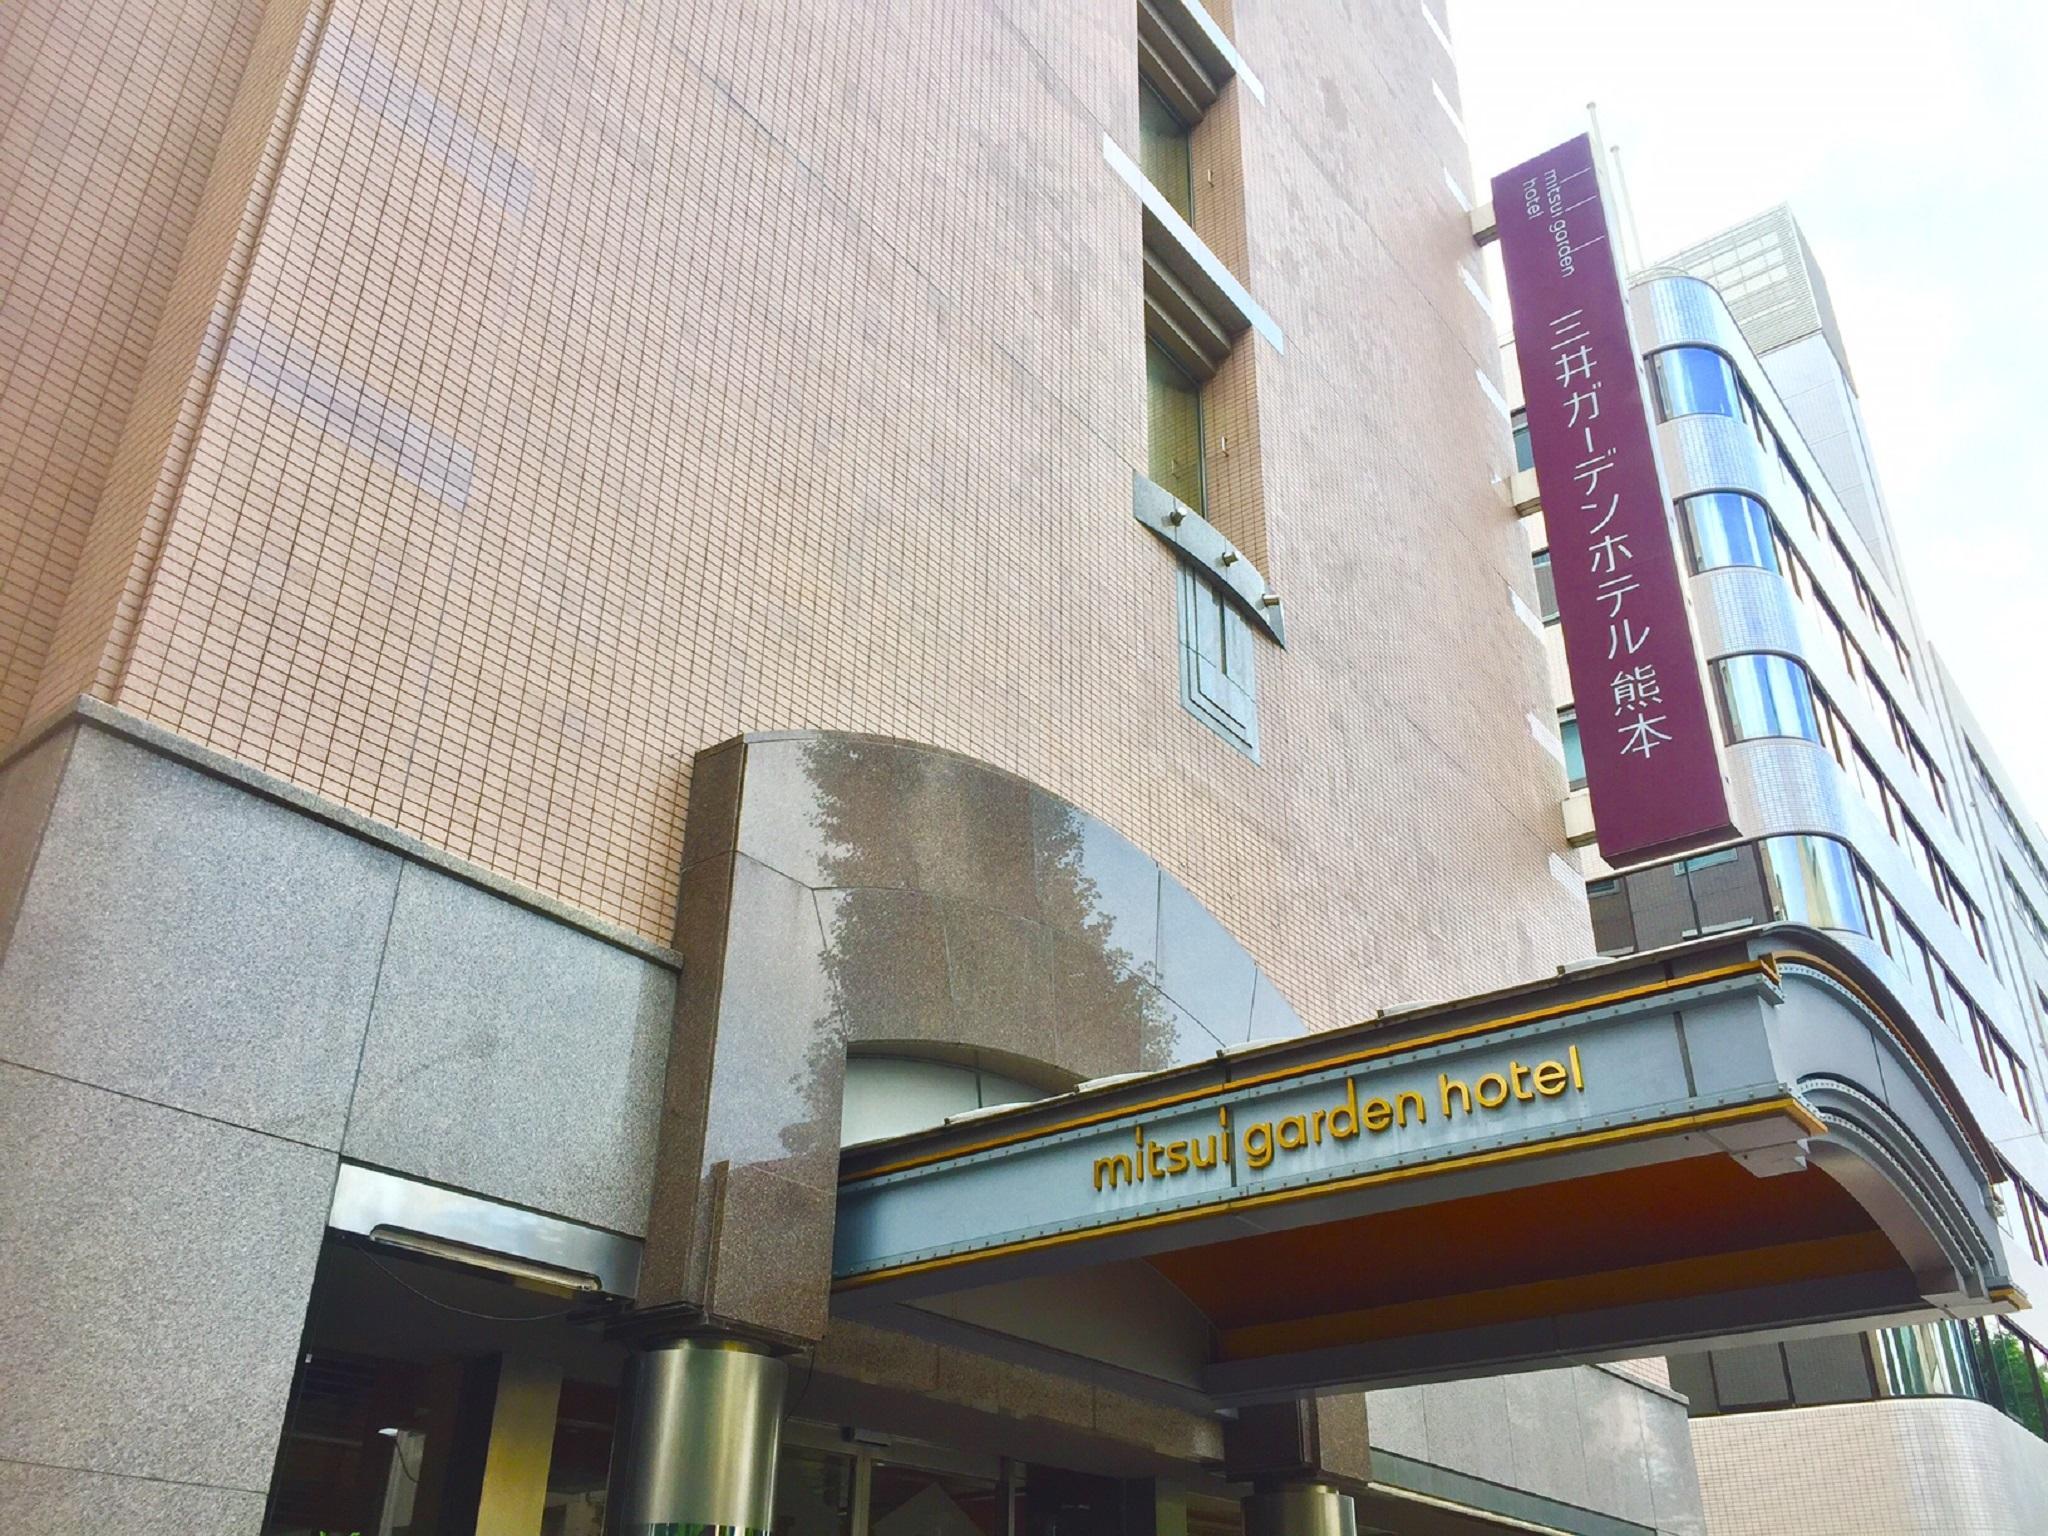 Mitsui Garden Hotel Kumamoto, Kumamoto